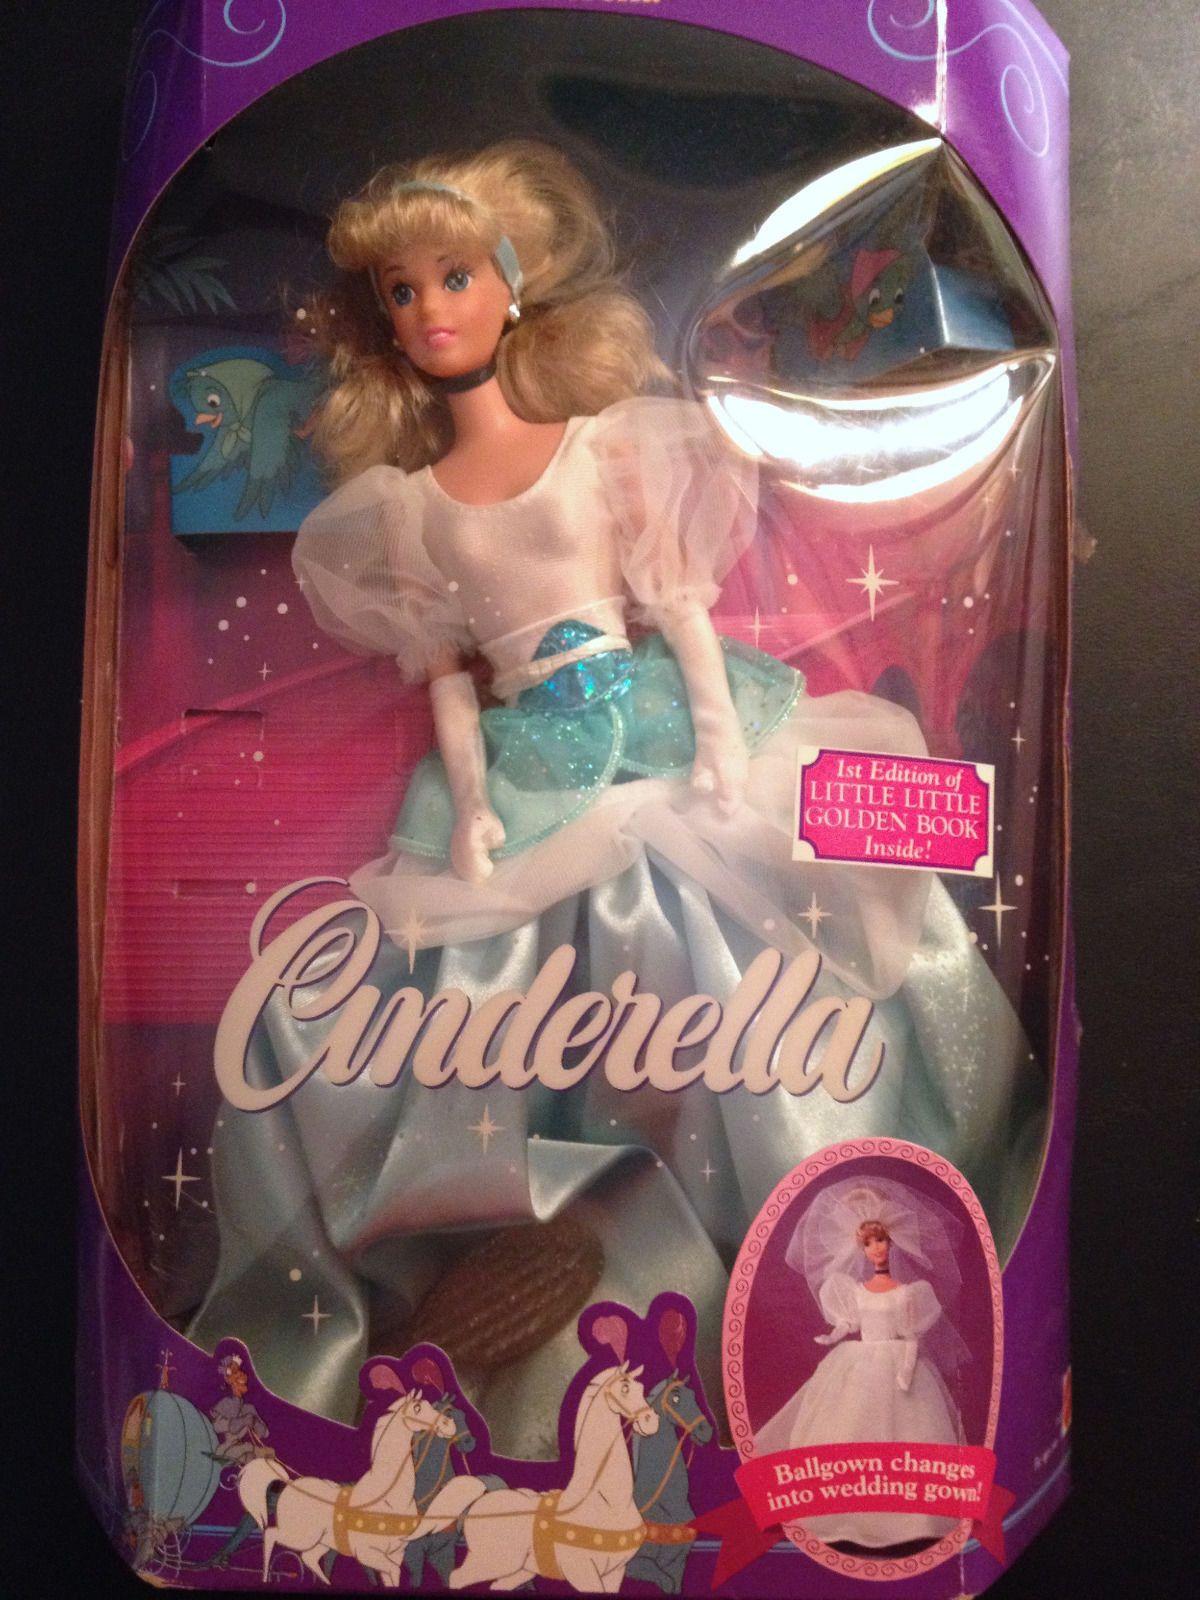 Barbie deluxe furniture stovetop to tabletop kitchen doll target - Mattel Barbie Sz Cinderella Disney Doll Lady Tremaine Kate Blanchett Movie Nrfb